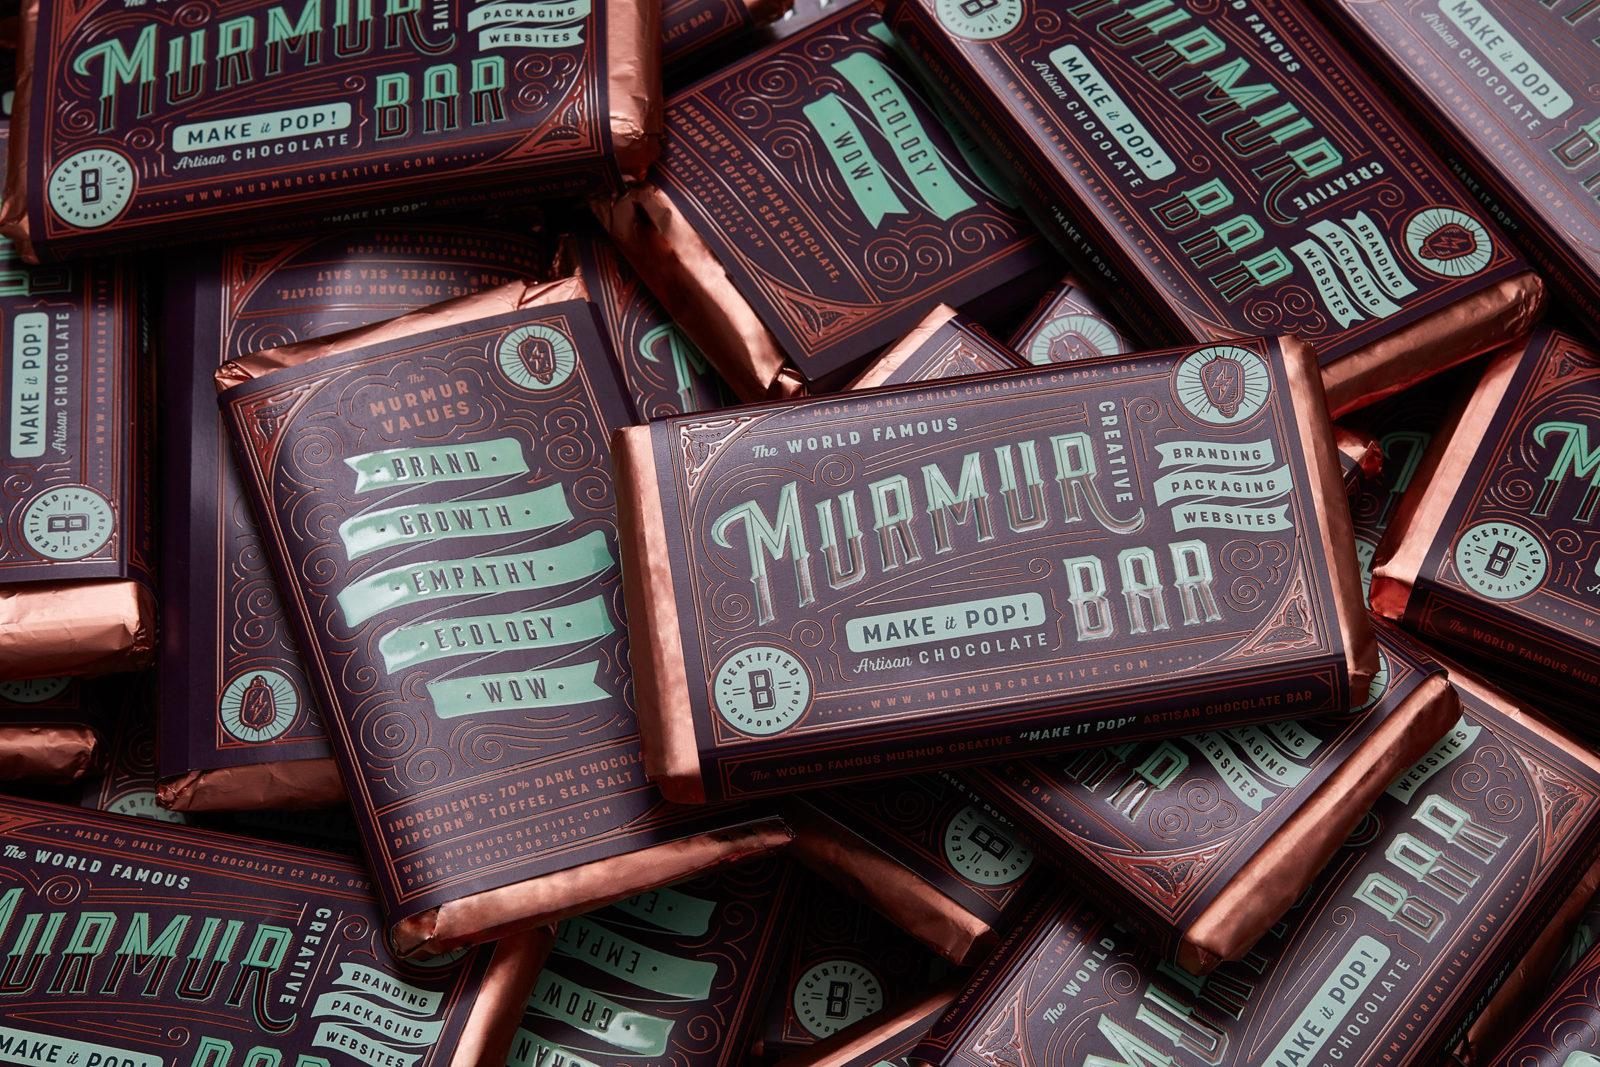 Murmur branded chocolate bar